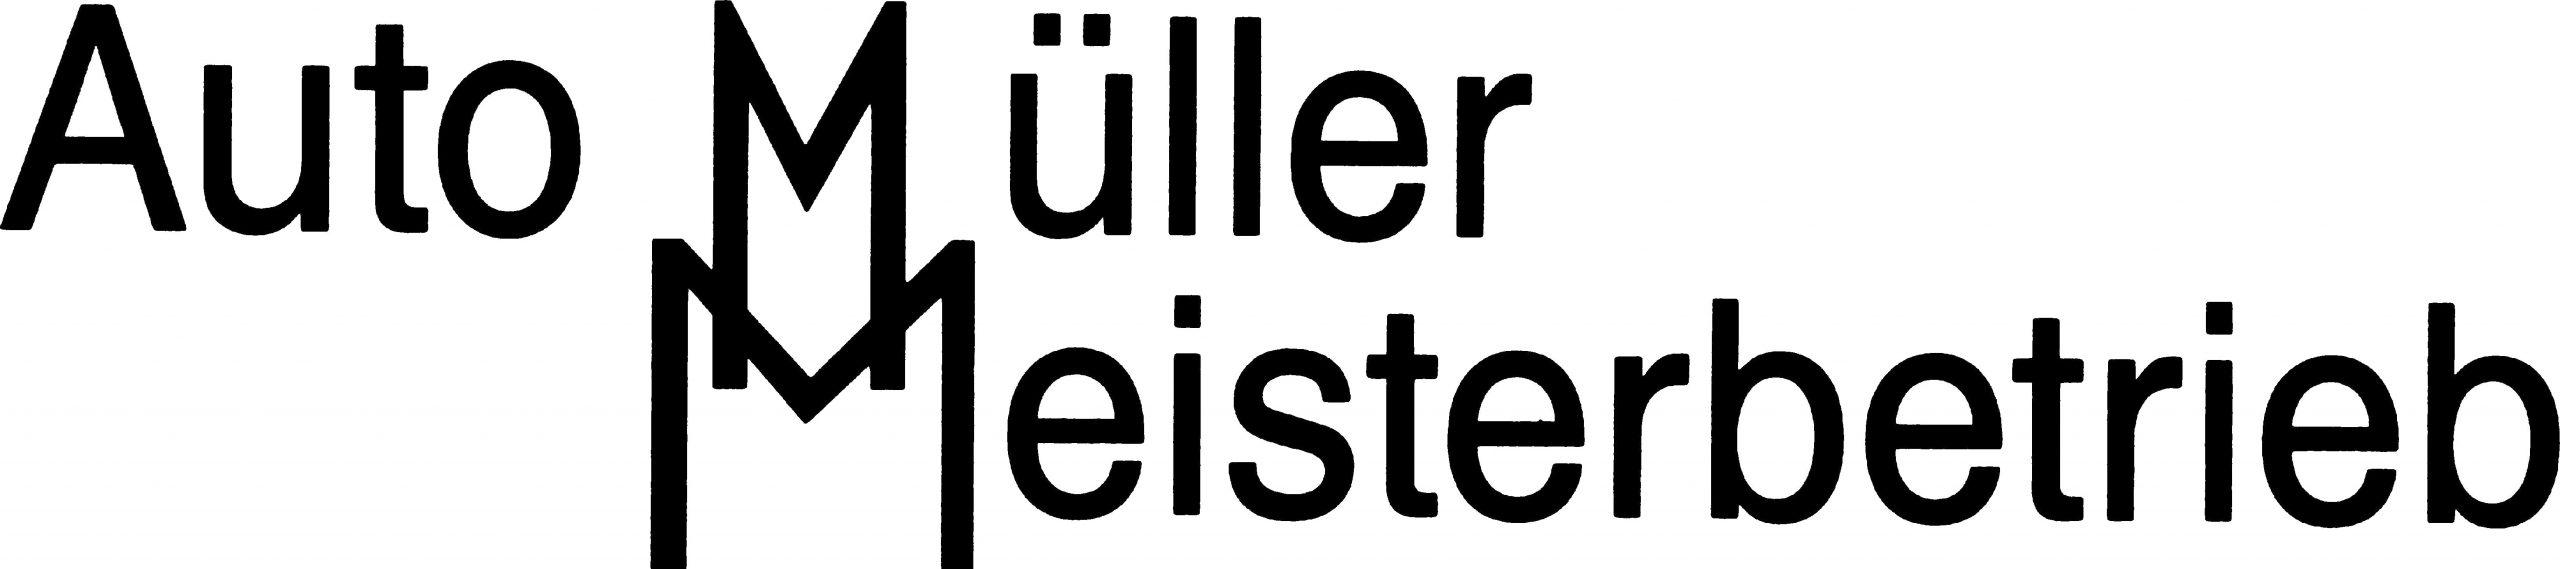 Auto Müller Meiserbetrieb